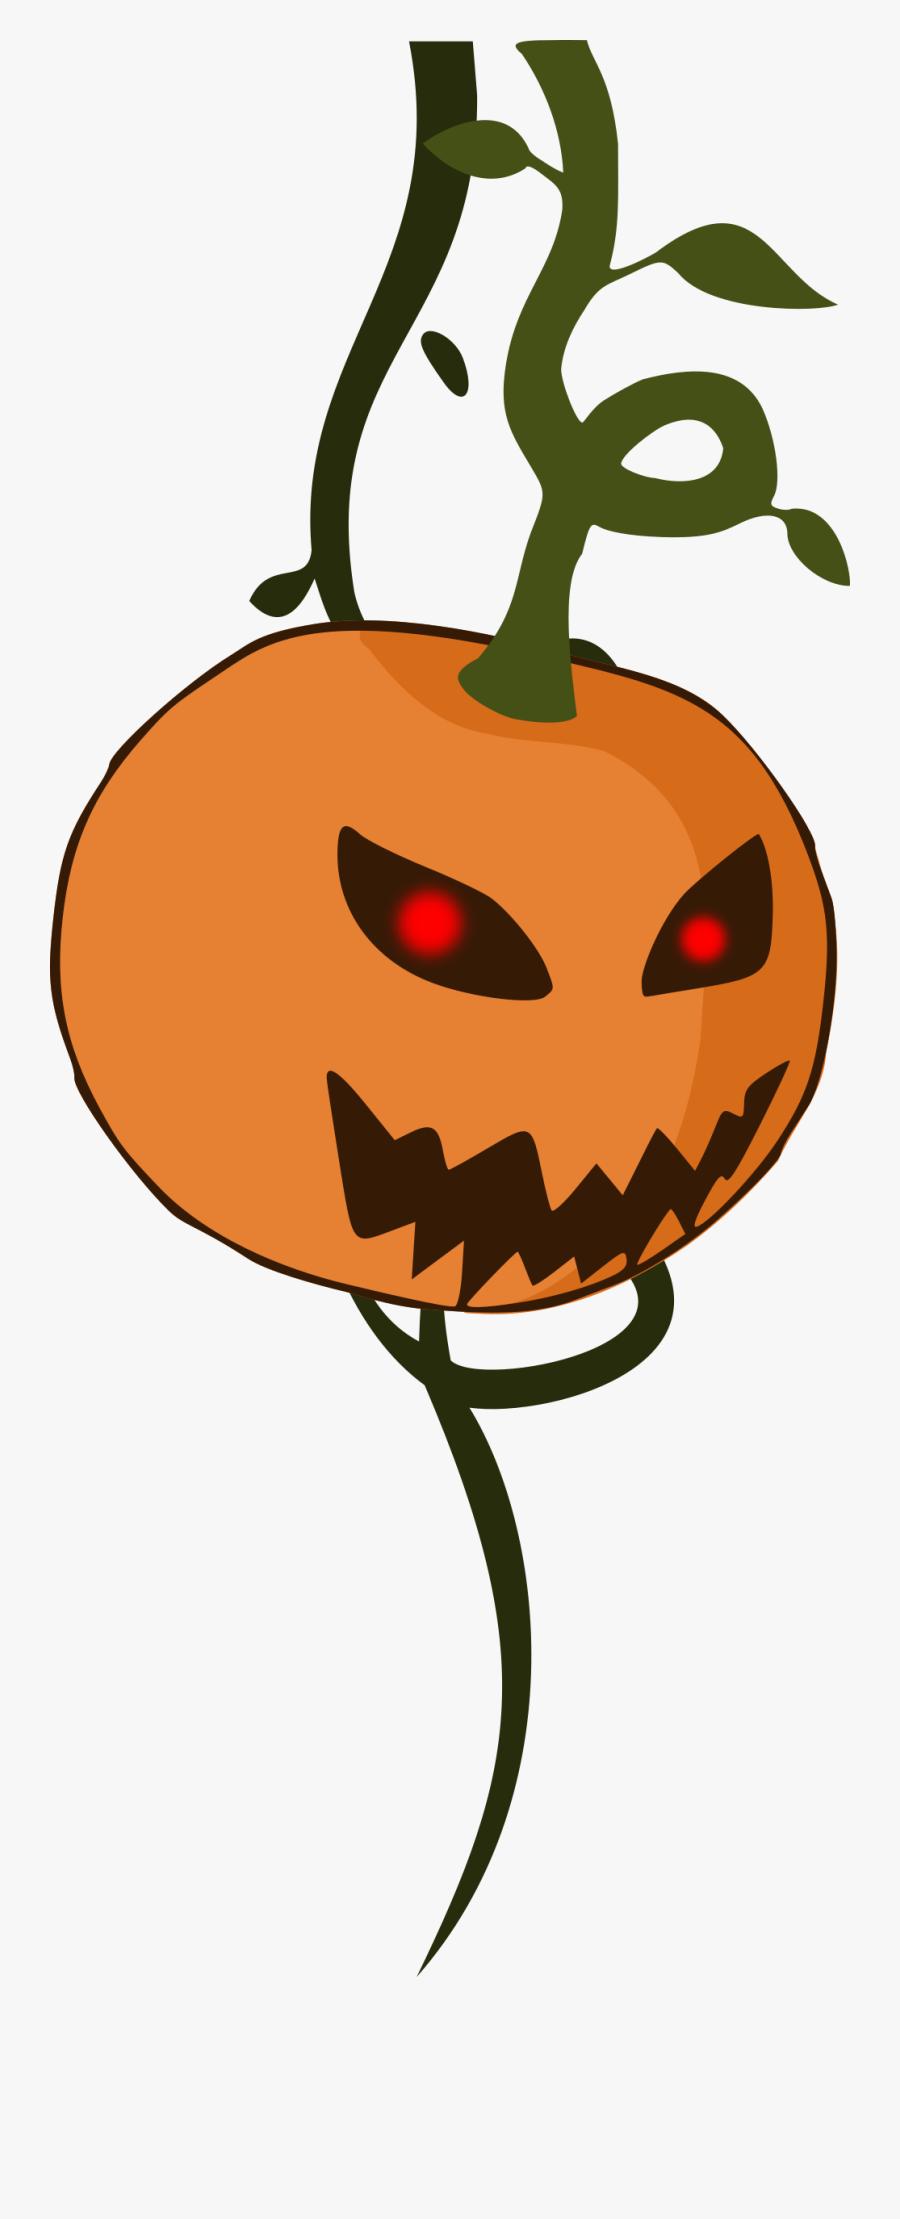 Vector Pumpkins Pumpkin Plant - Kürbis Schnitzen Bilder Katze, Transparent Clipart